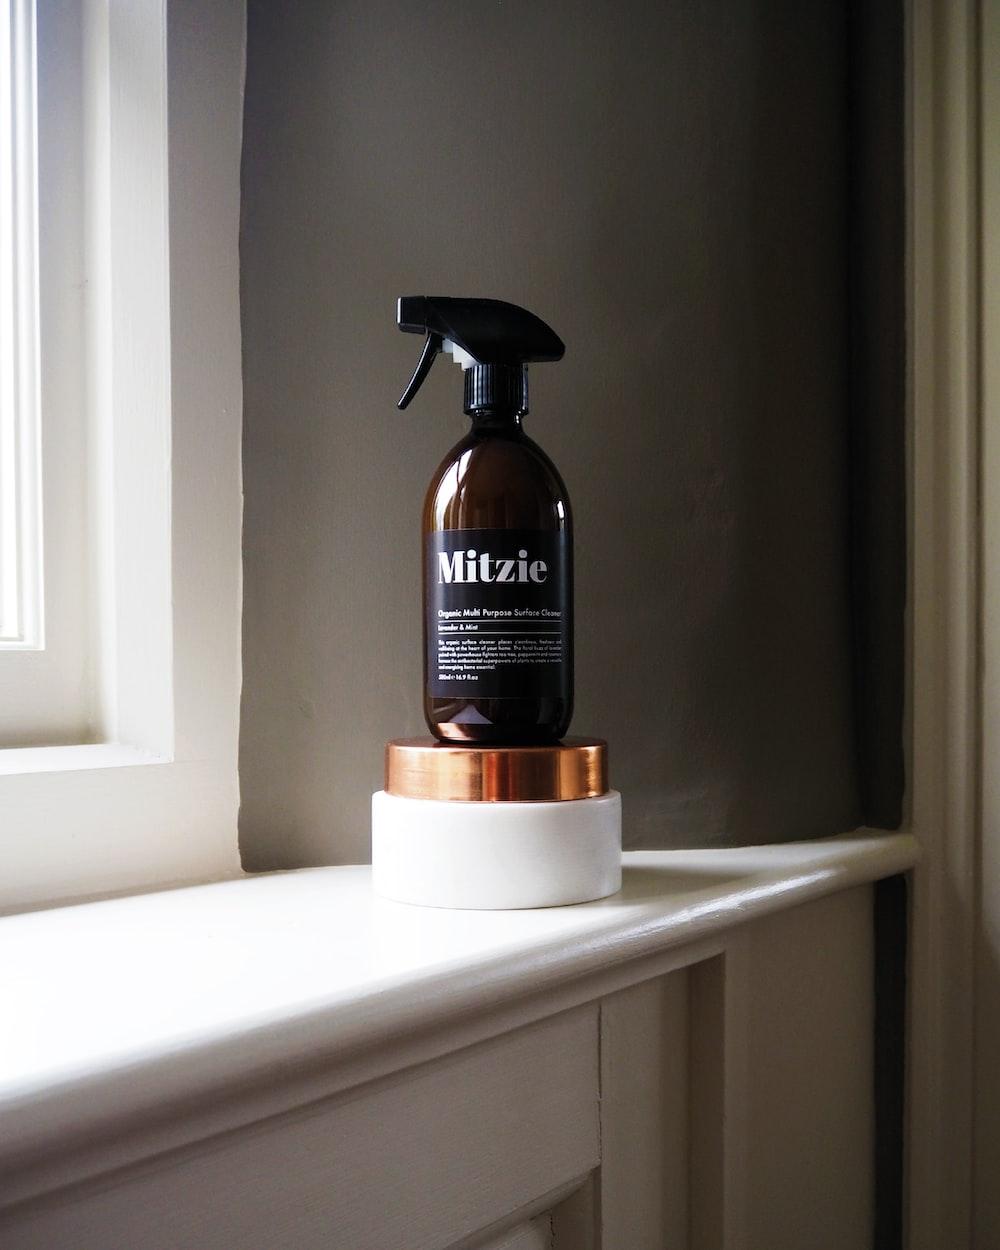 black Mitzie spray bottle near window